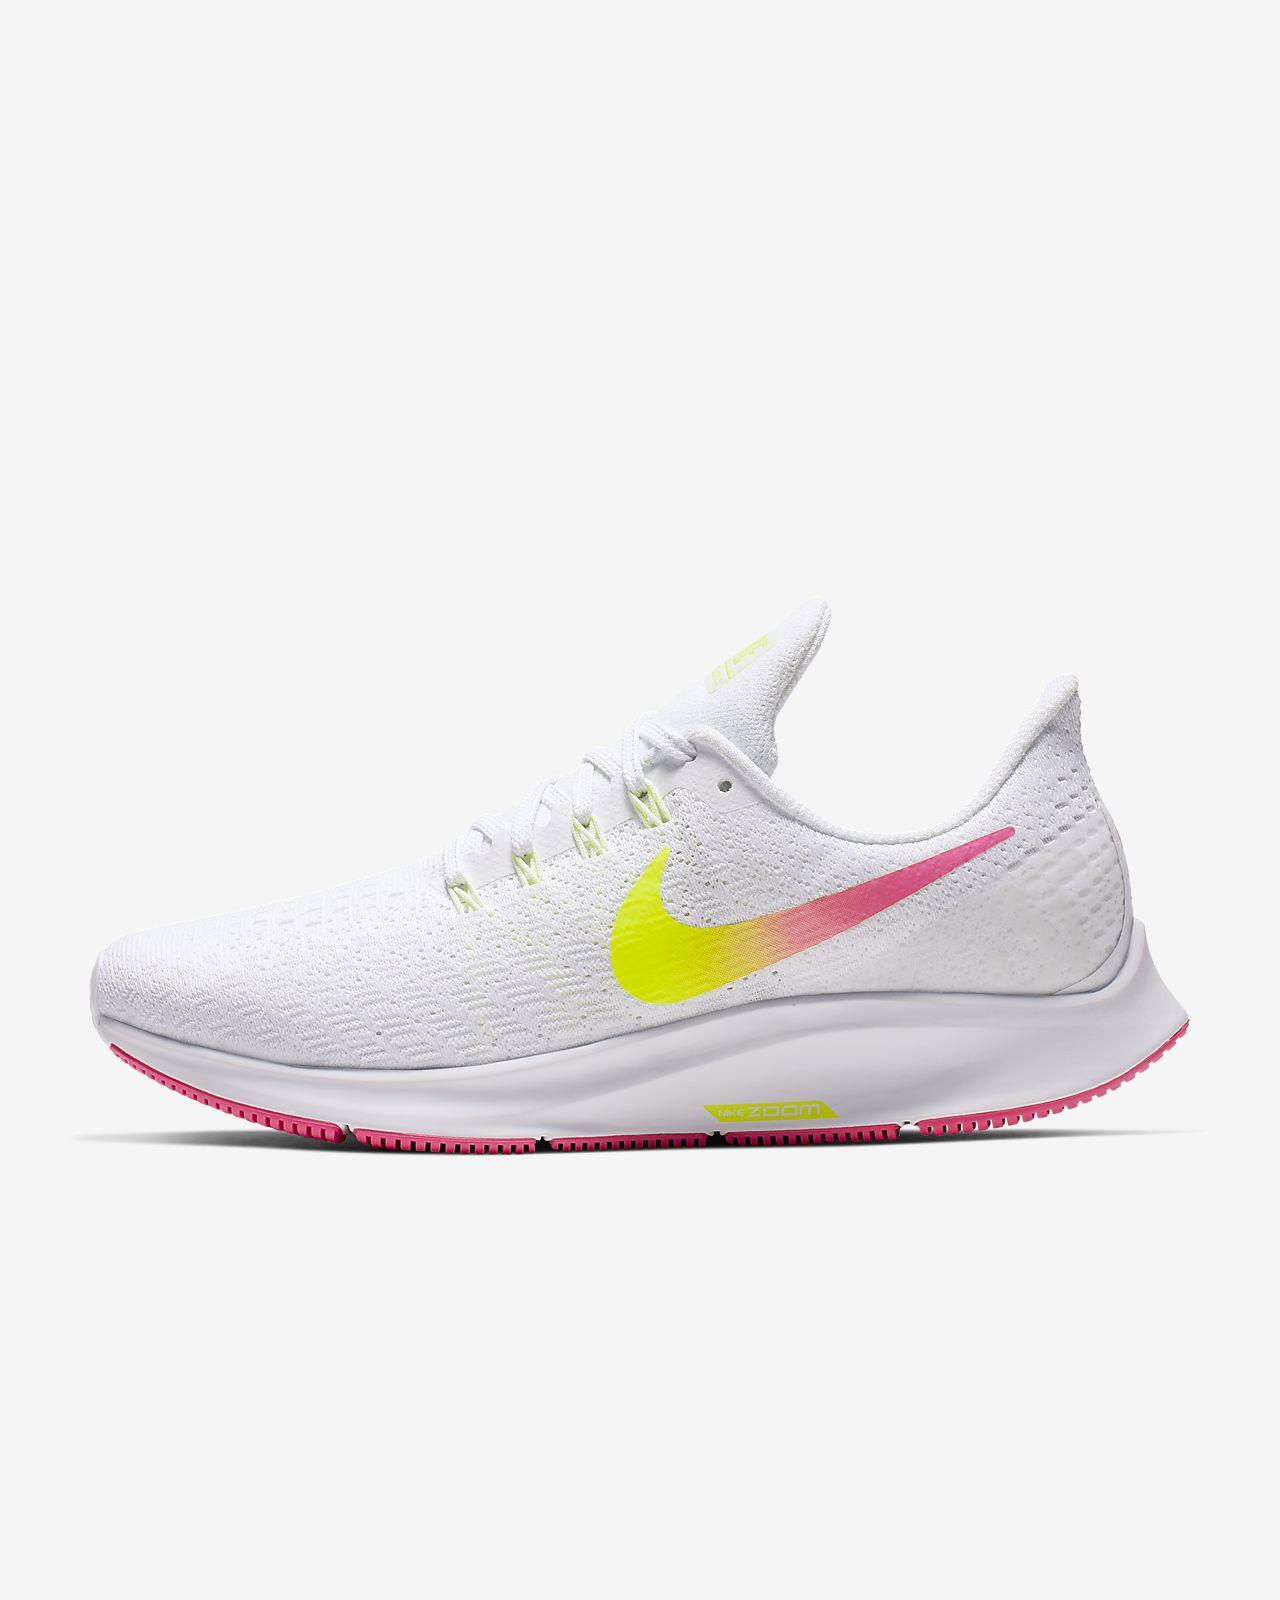 the best attitude 48ca7 c8943 ... Damskie buty do biegania Nike Air Zoom Pegasus 35